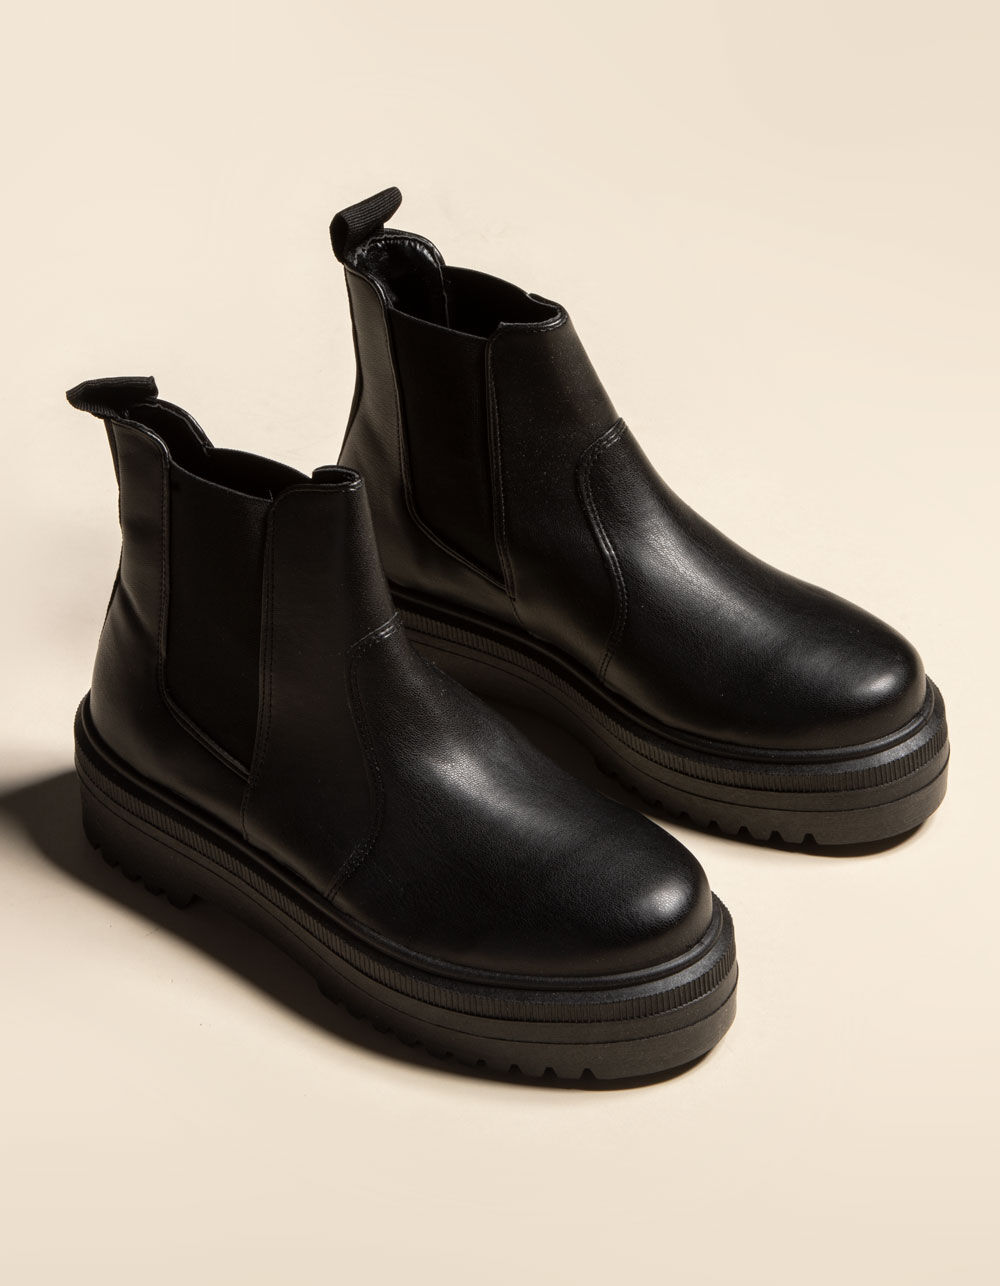 STEVE MADDEN Yardley Boots